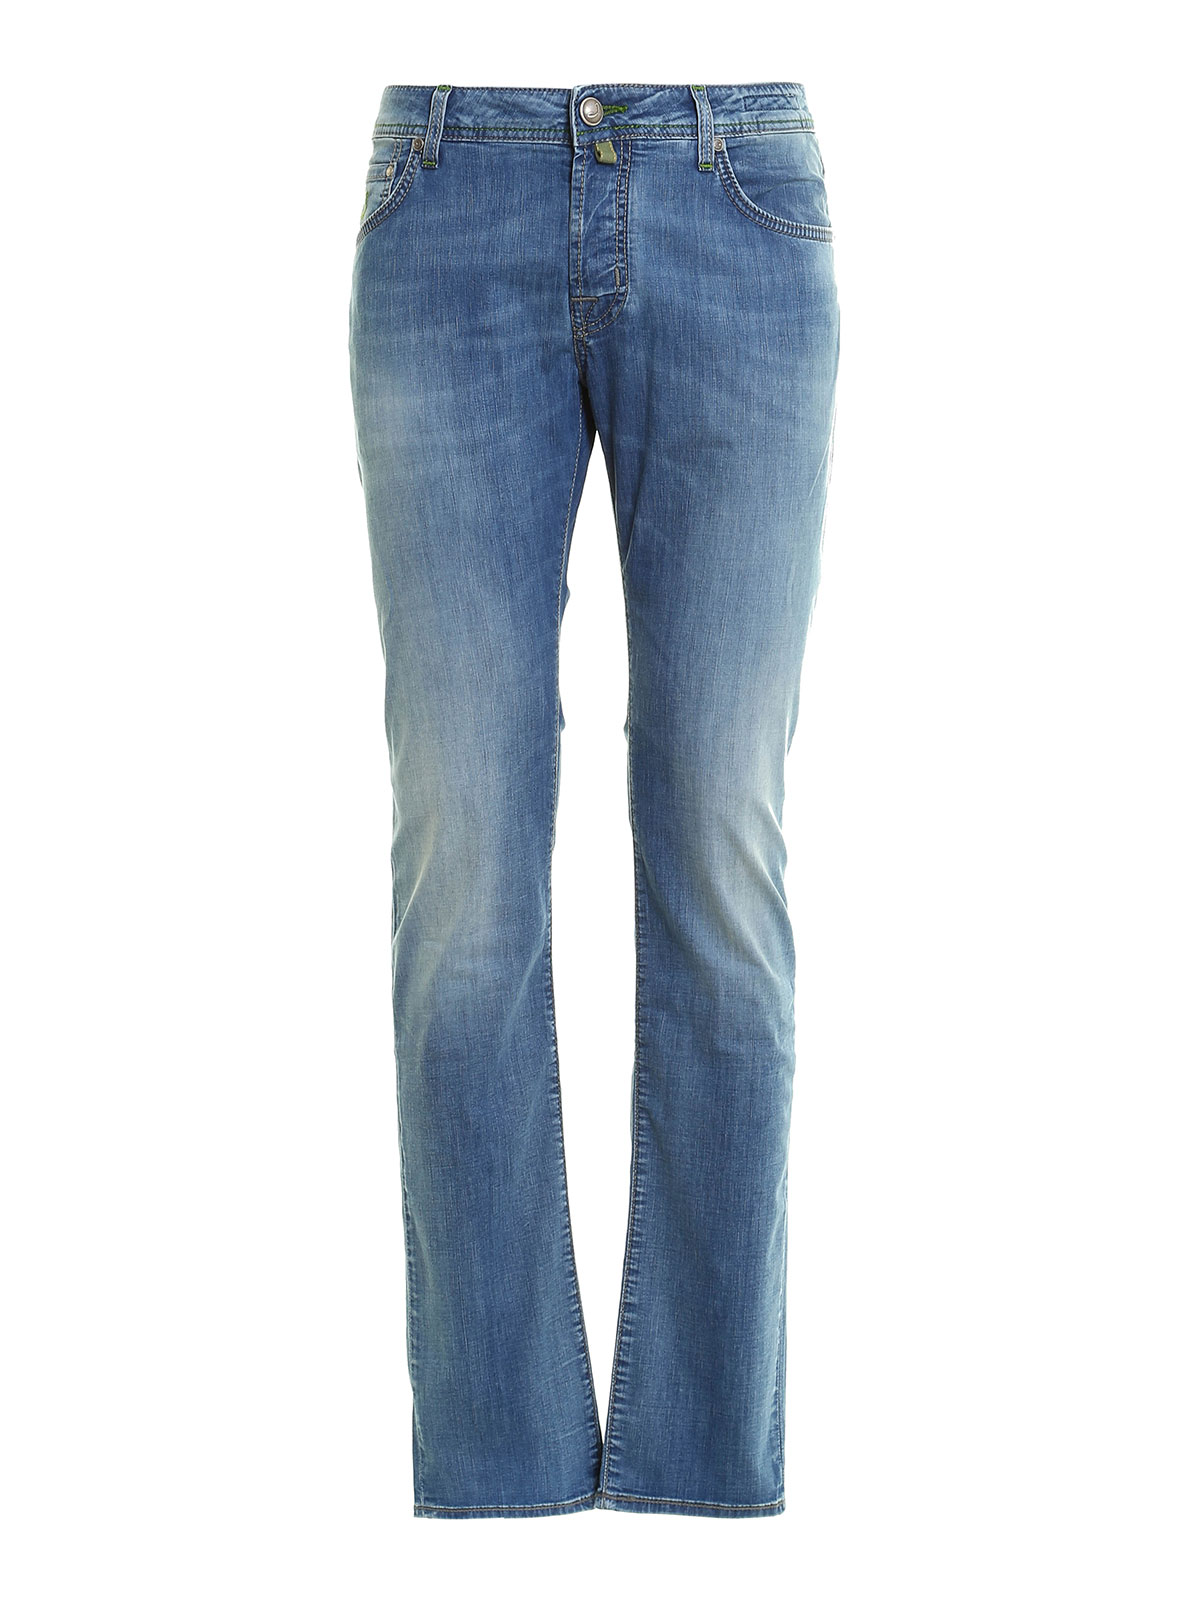 622 washed jeans by jacob cohen straight leg jeans ikrix - Jacob cohen denim ...